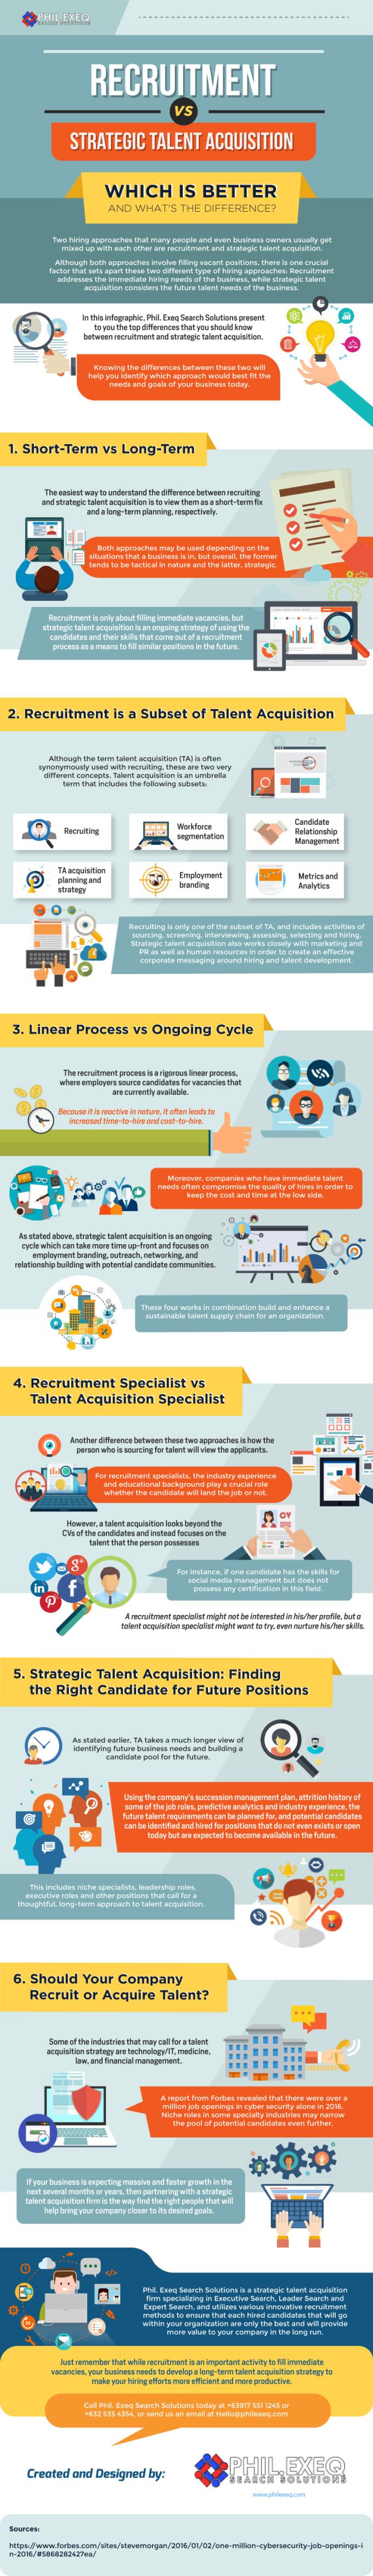 Recruitment vs Strategic Talent Acquisition [Infographic]